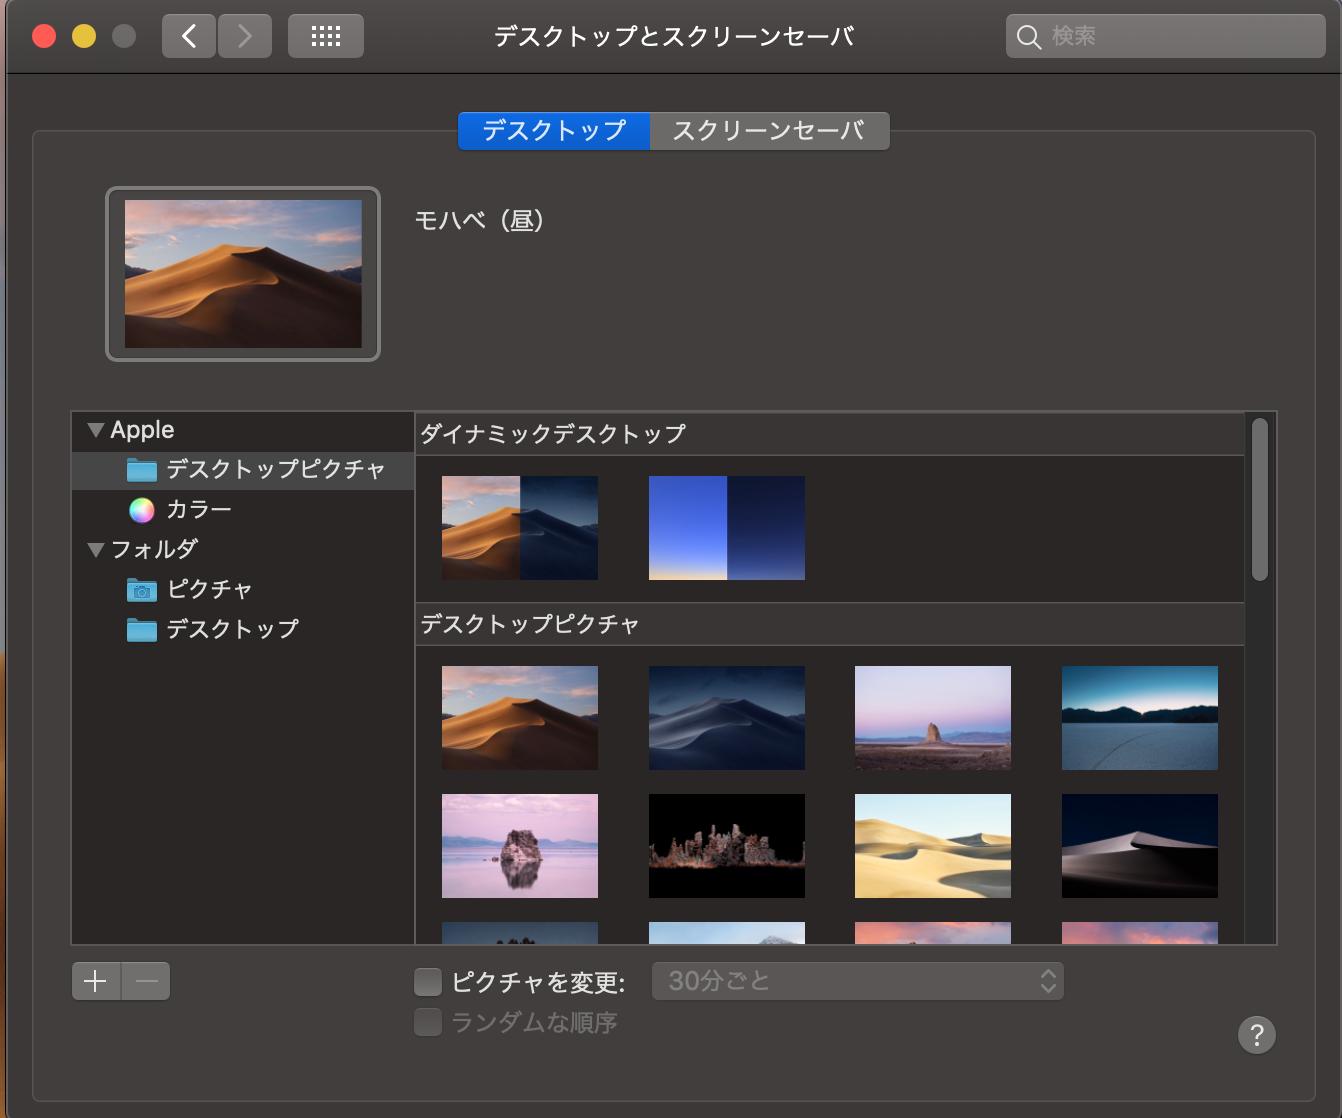 Macの壁紙を簡単に変更する 複数のデスクトップピクチャを一括で変更するには アプリやwebの疑問に答えるメディア